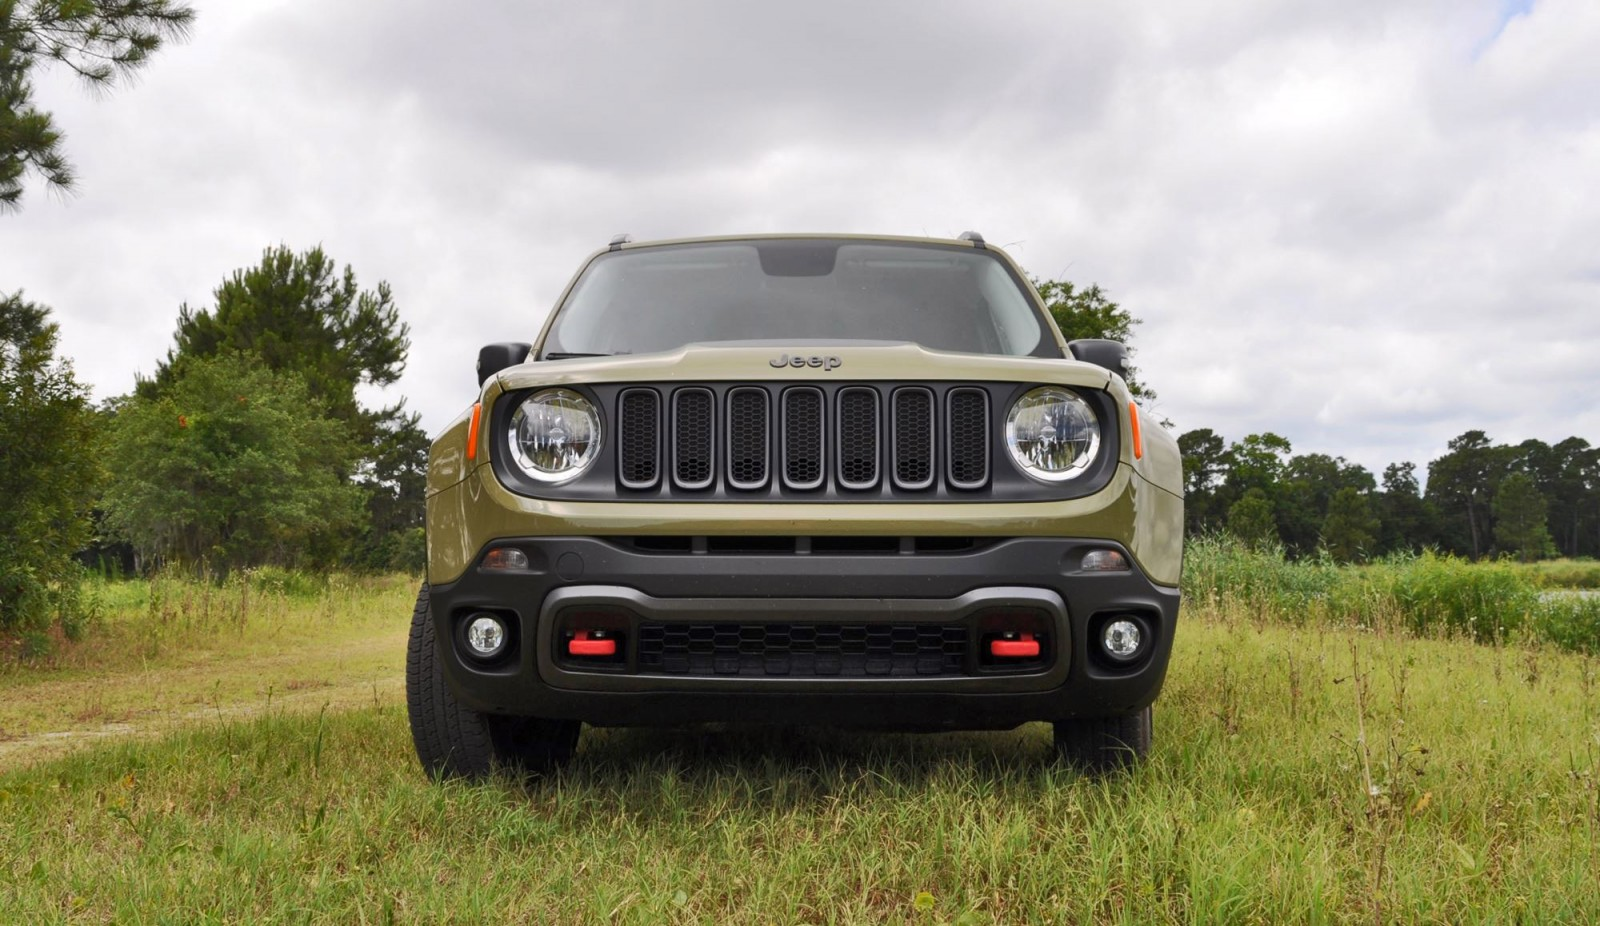 2015 jeep renegade trailhawk review 100 car revs. Black Bedroom Furniture Sets. Home Design Ideas